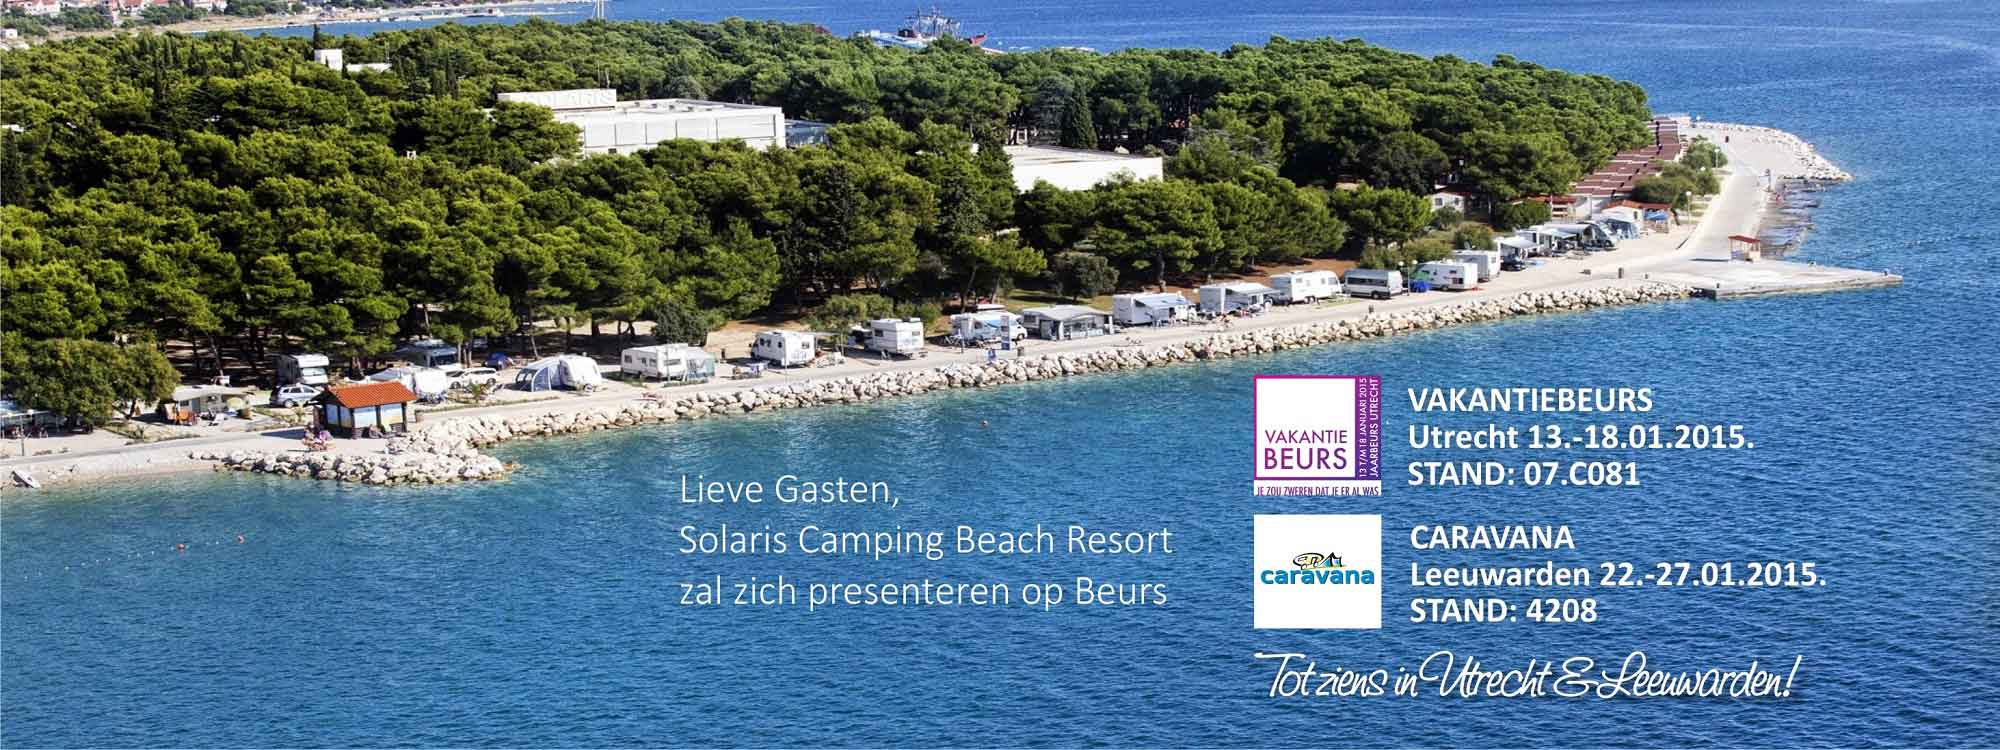 Leeuwarden-_utrecht_beurs-solarisCamping_beach-resort_-niz.-slider